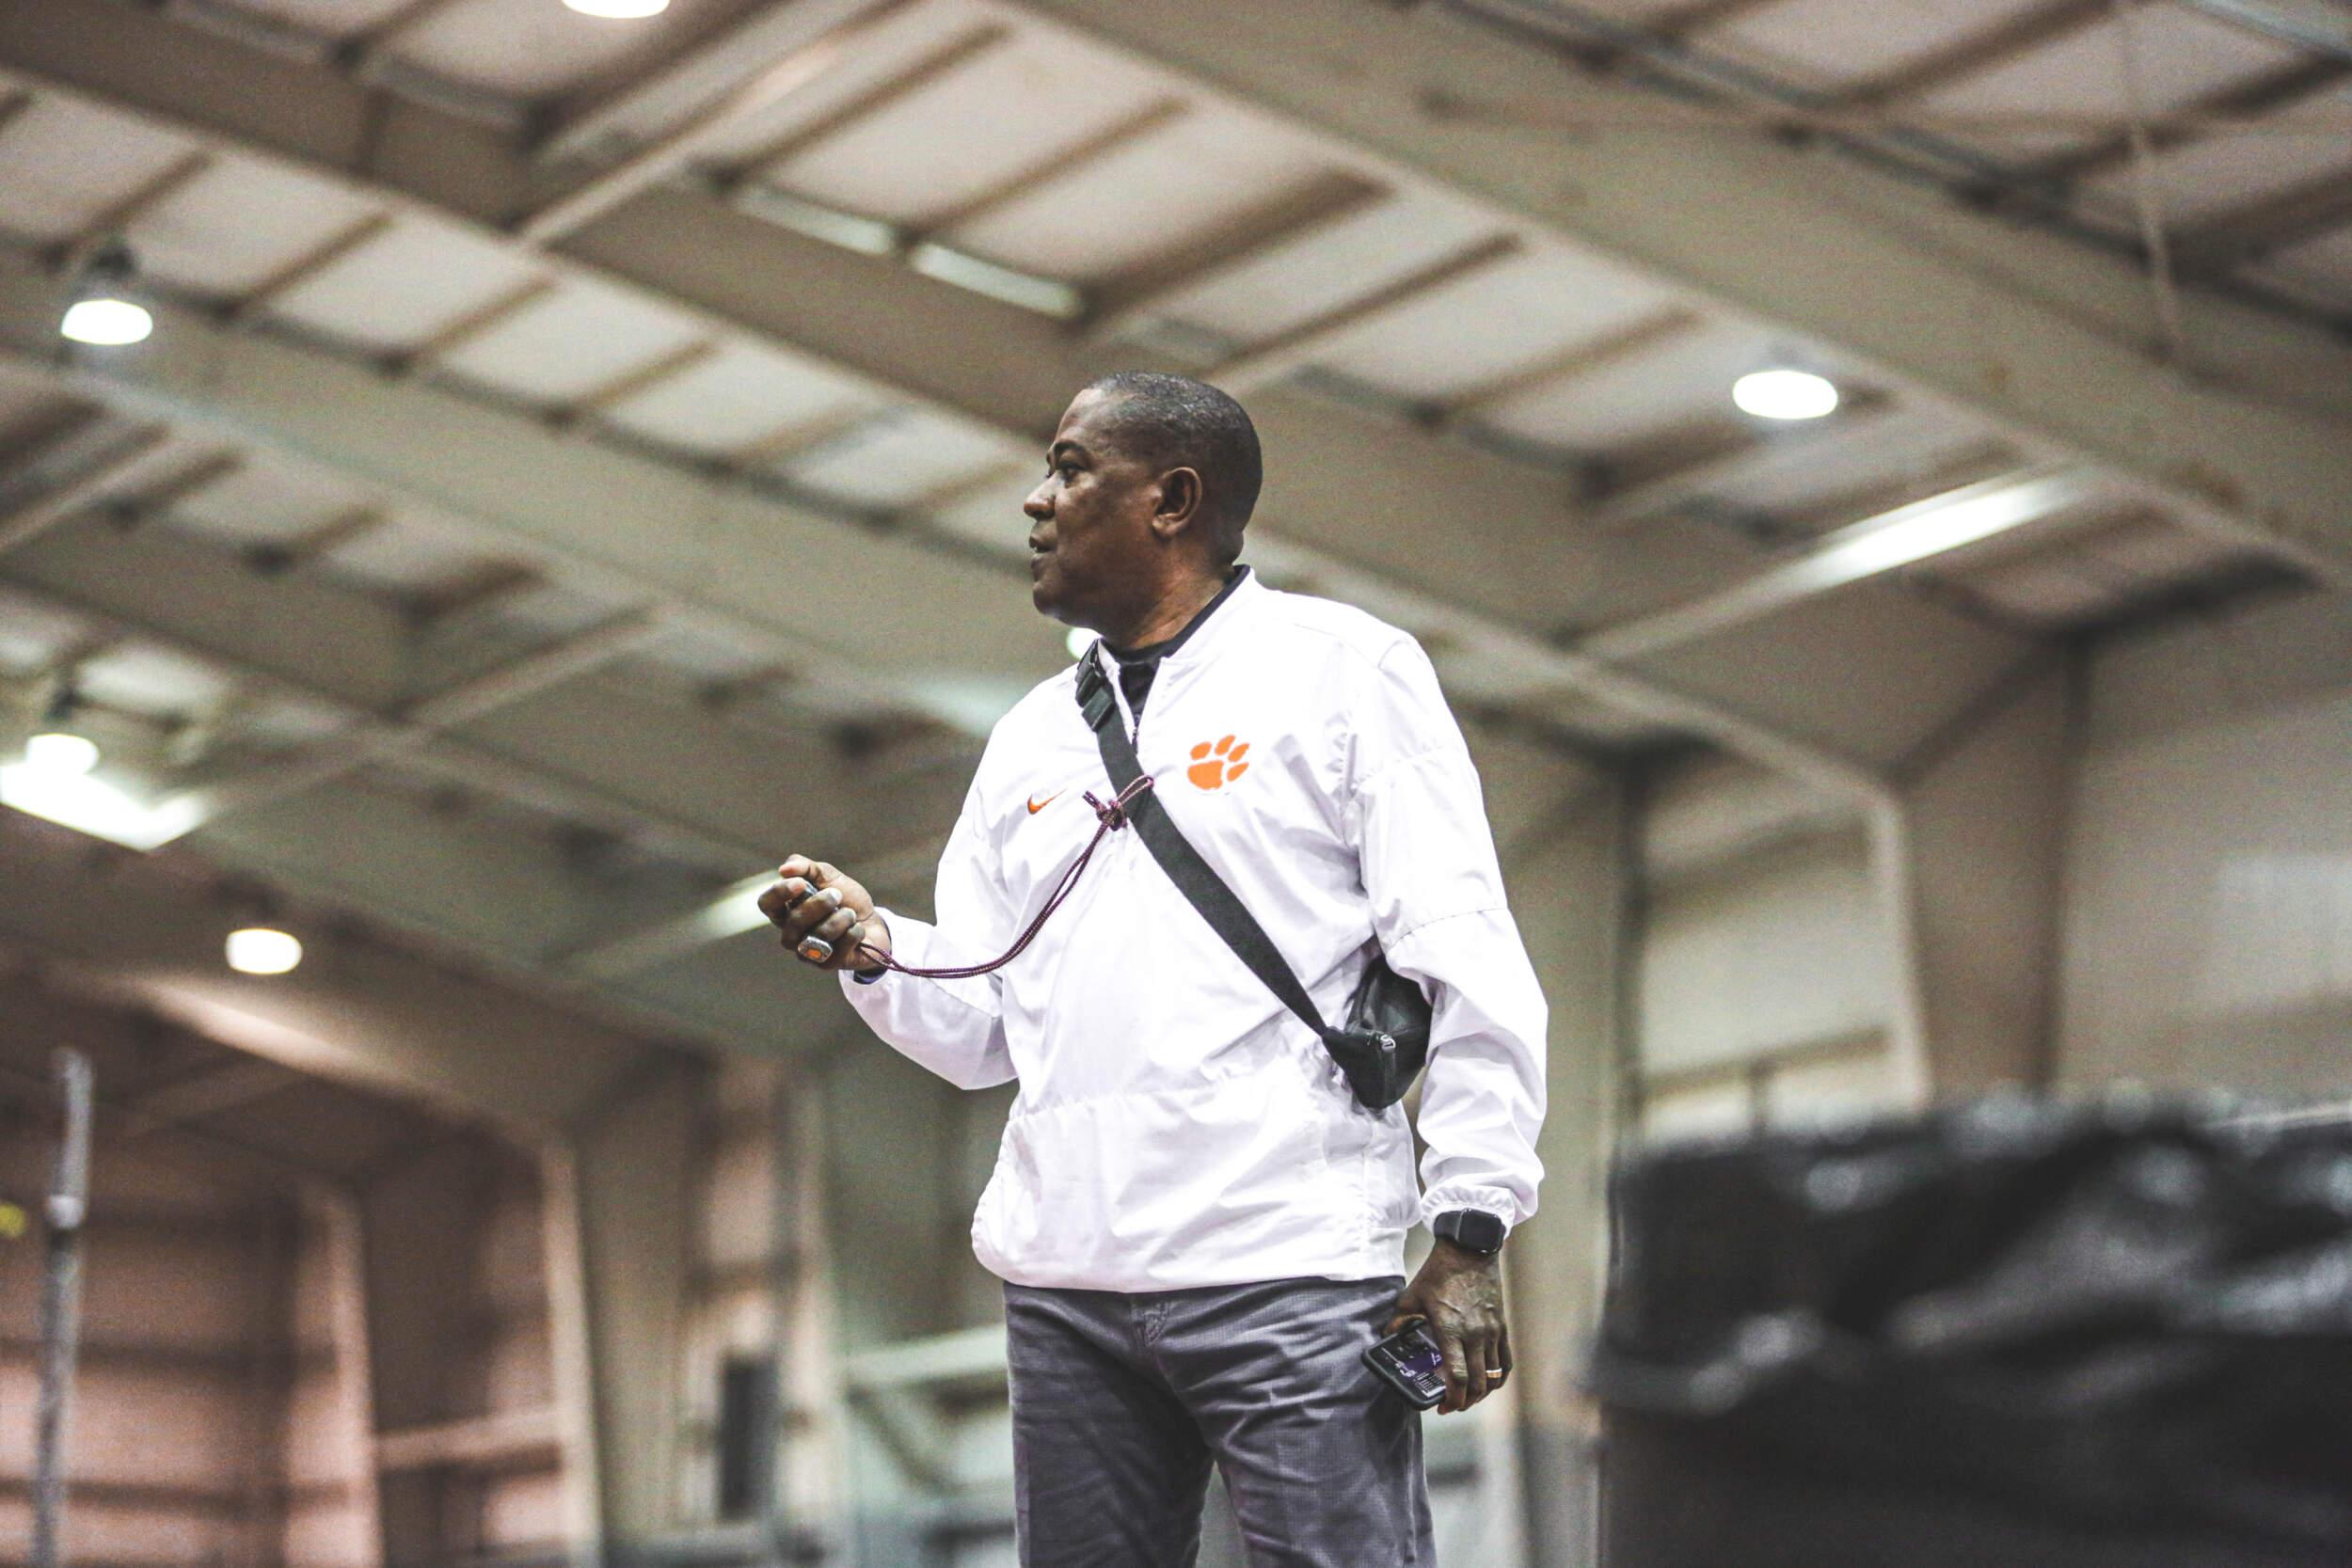 2020 Track & Field Recruiting Class: Transfers